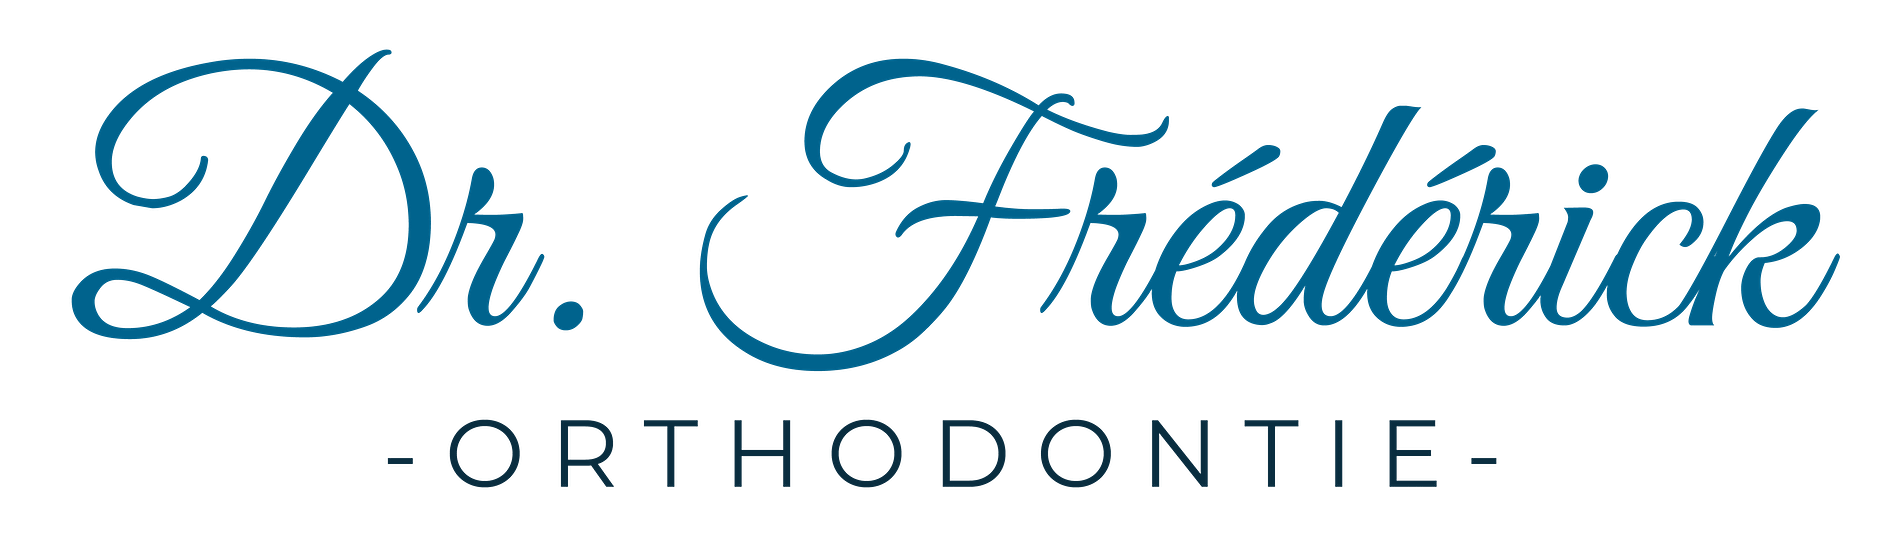 Dr FREDERICK, Orthodontie Invisalign Aigle